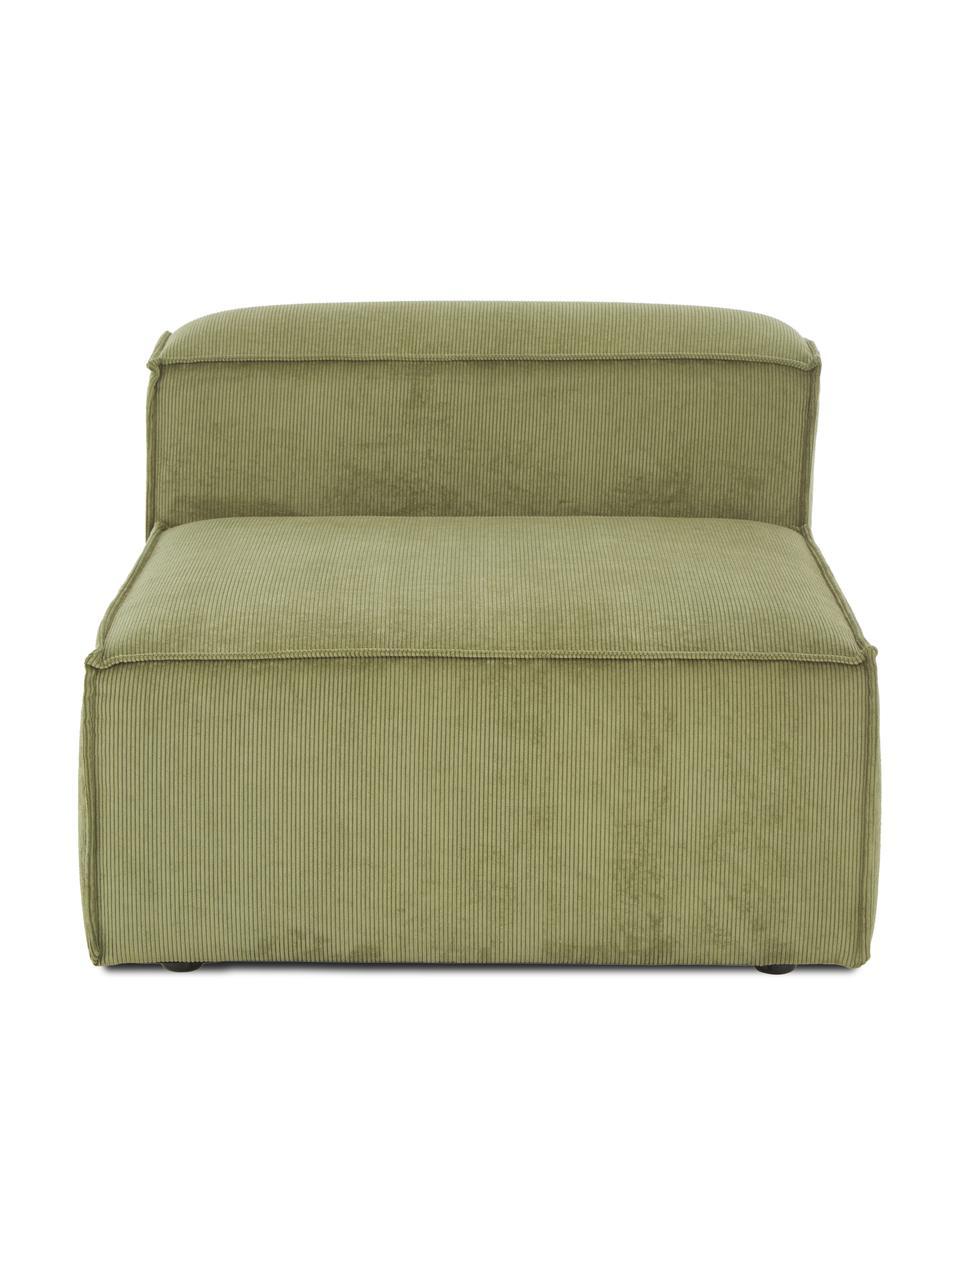 Middelste module Lennon in groen van corduroy, Bekleding: corduroy (92% polyester, , Frame: massief grenenhout, multi, Poten: kunststof De poten bevind, Corduroy groen, 89 x 119 cm